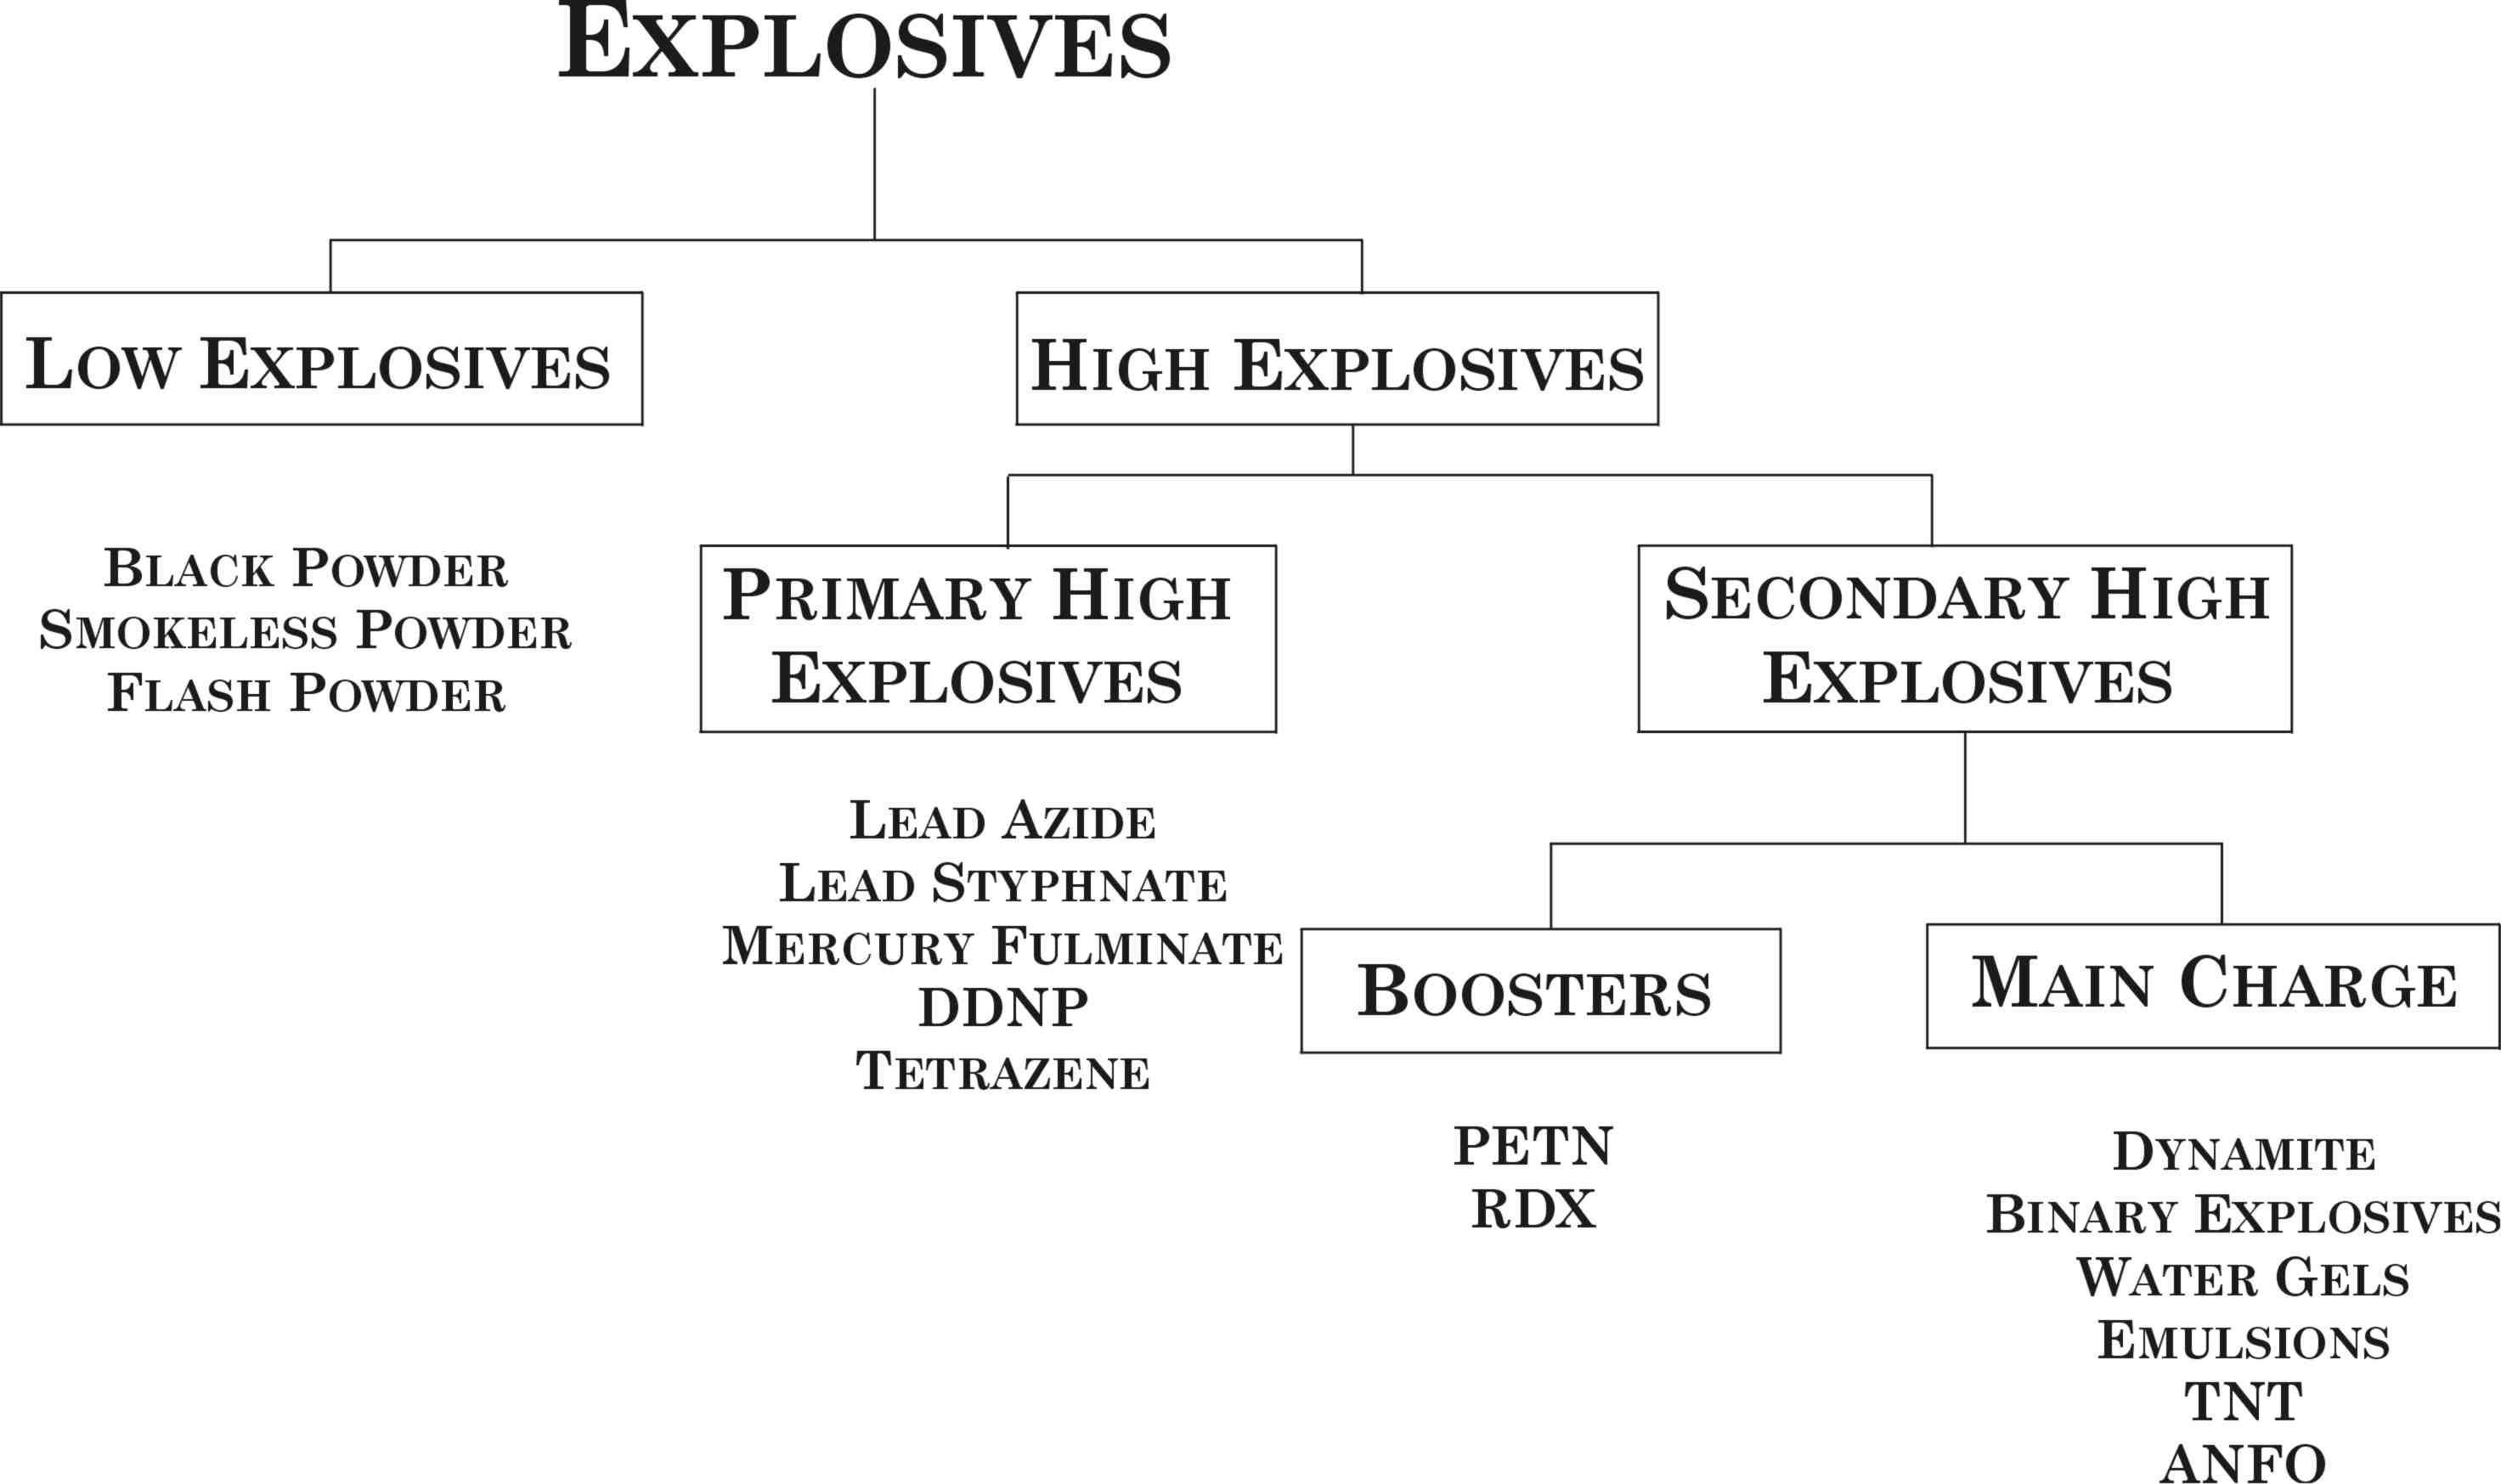 explosives department of transportation dot definition explosives an    Chemical Explosives